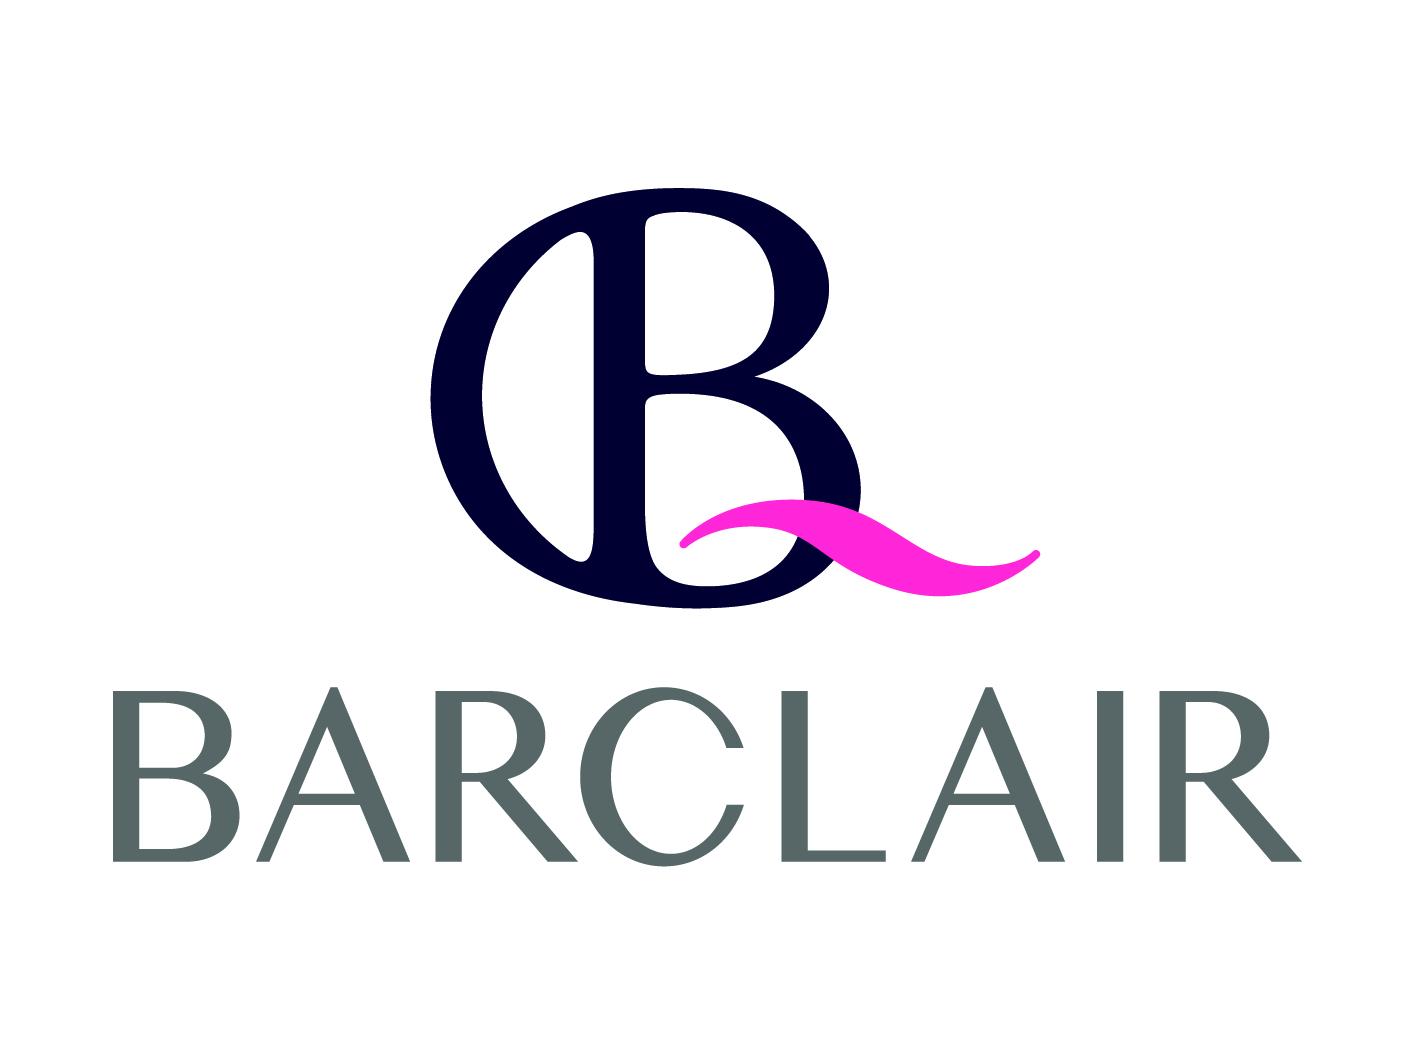 barclair